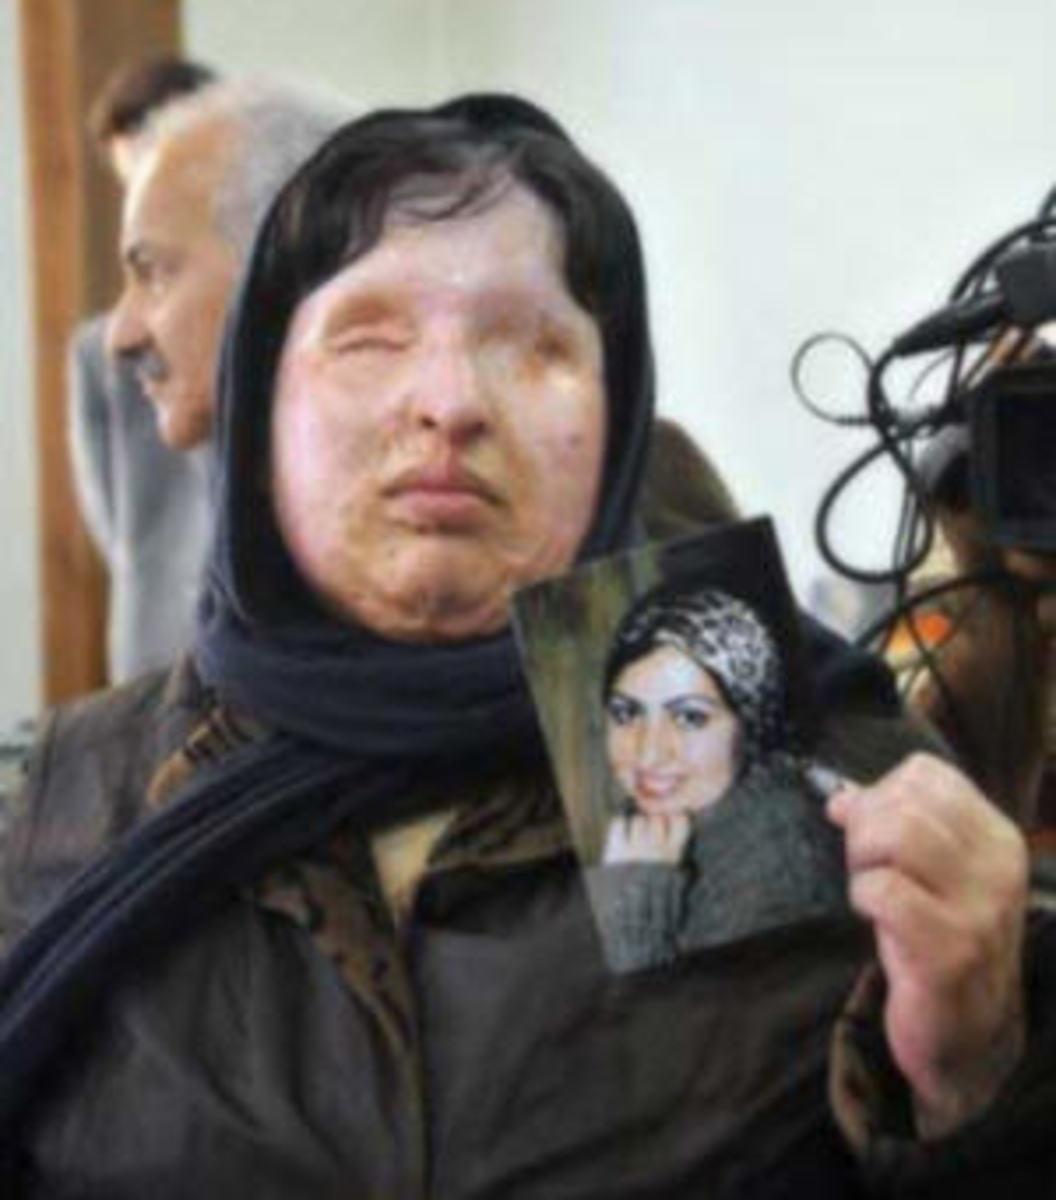 One victim of acid attacks